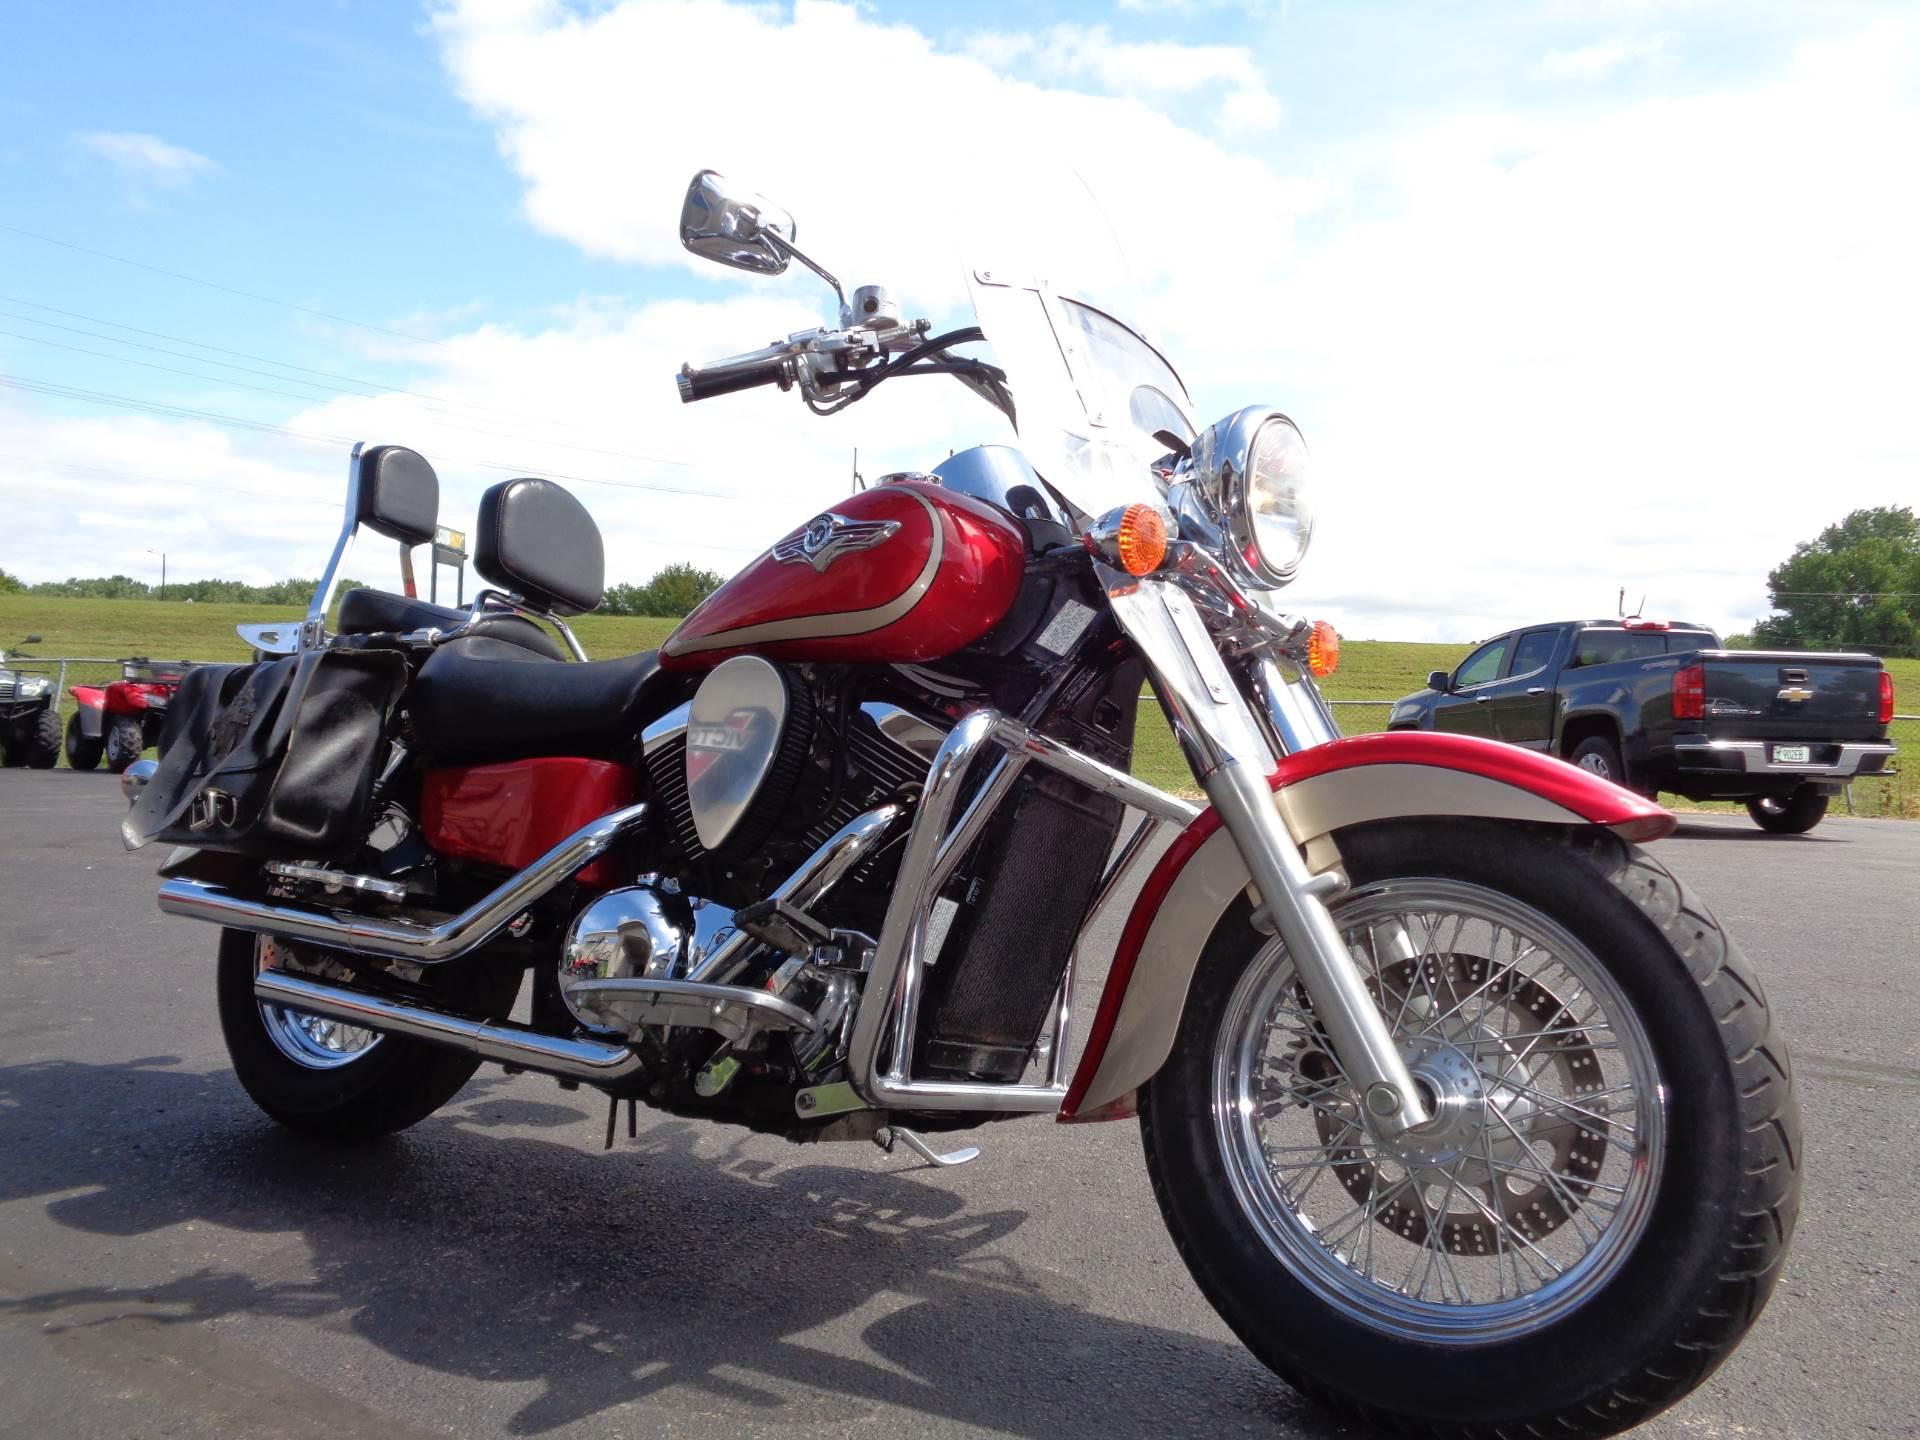 2000 Kawasaki Vulcan 1500 Classic Fi Motorcycles North Mankato Fuel Filter In Minnesota